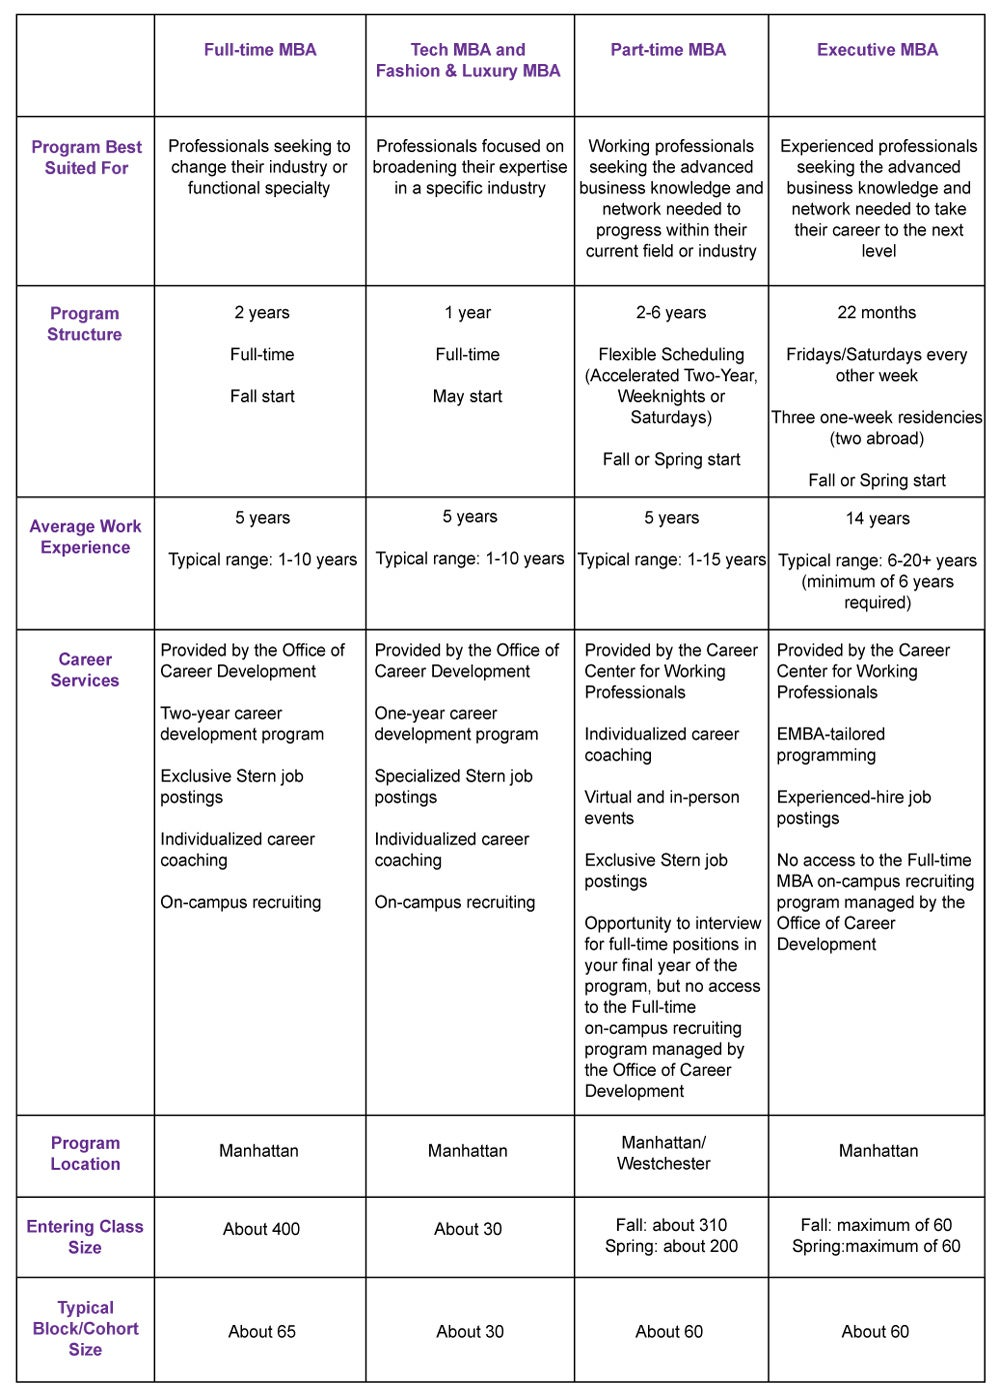 [PTMBA] Comp MBA Programs